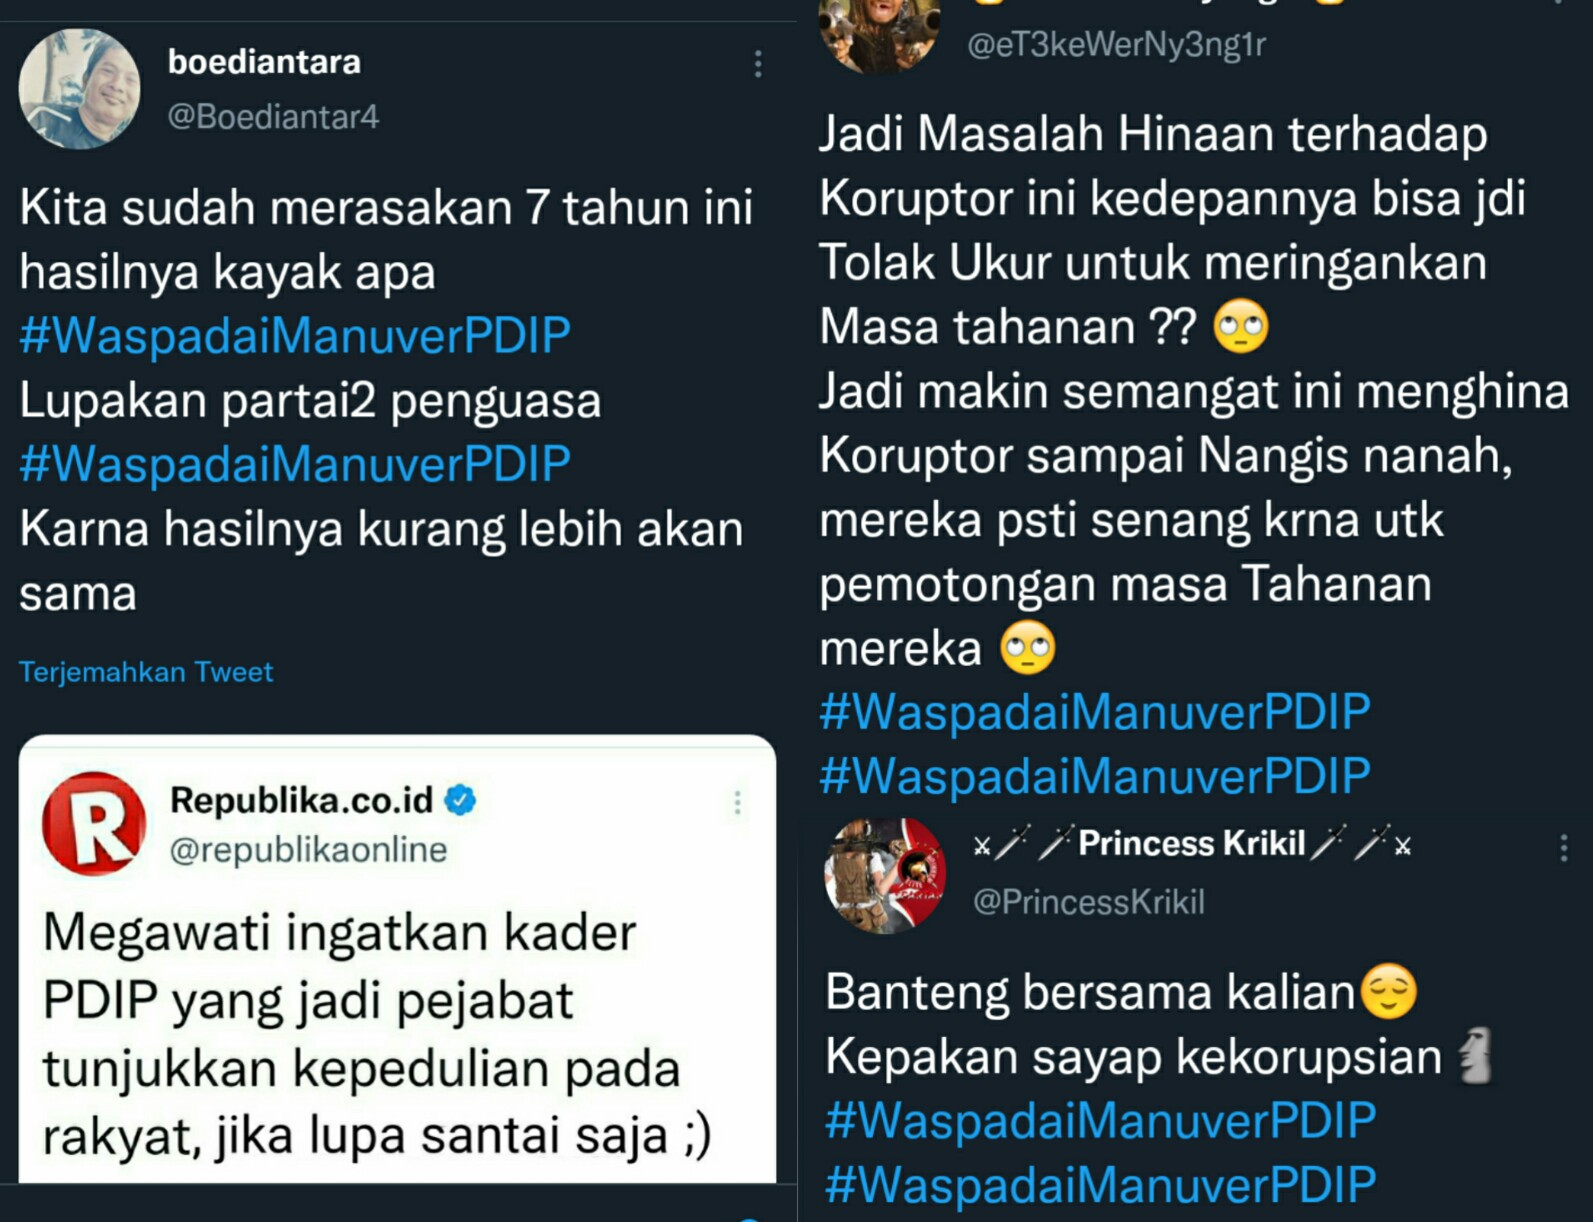 Trending Tagar #WaspadaiManuverPDIP, Netizen: Kepak Sayap Kekorupsian!